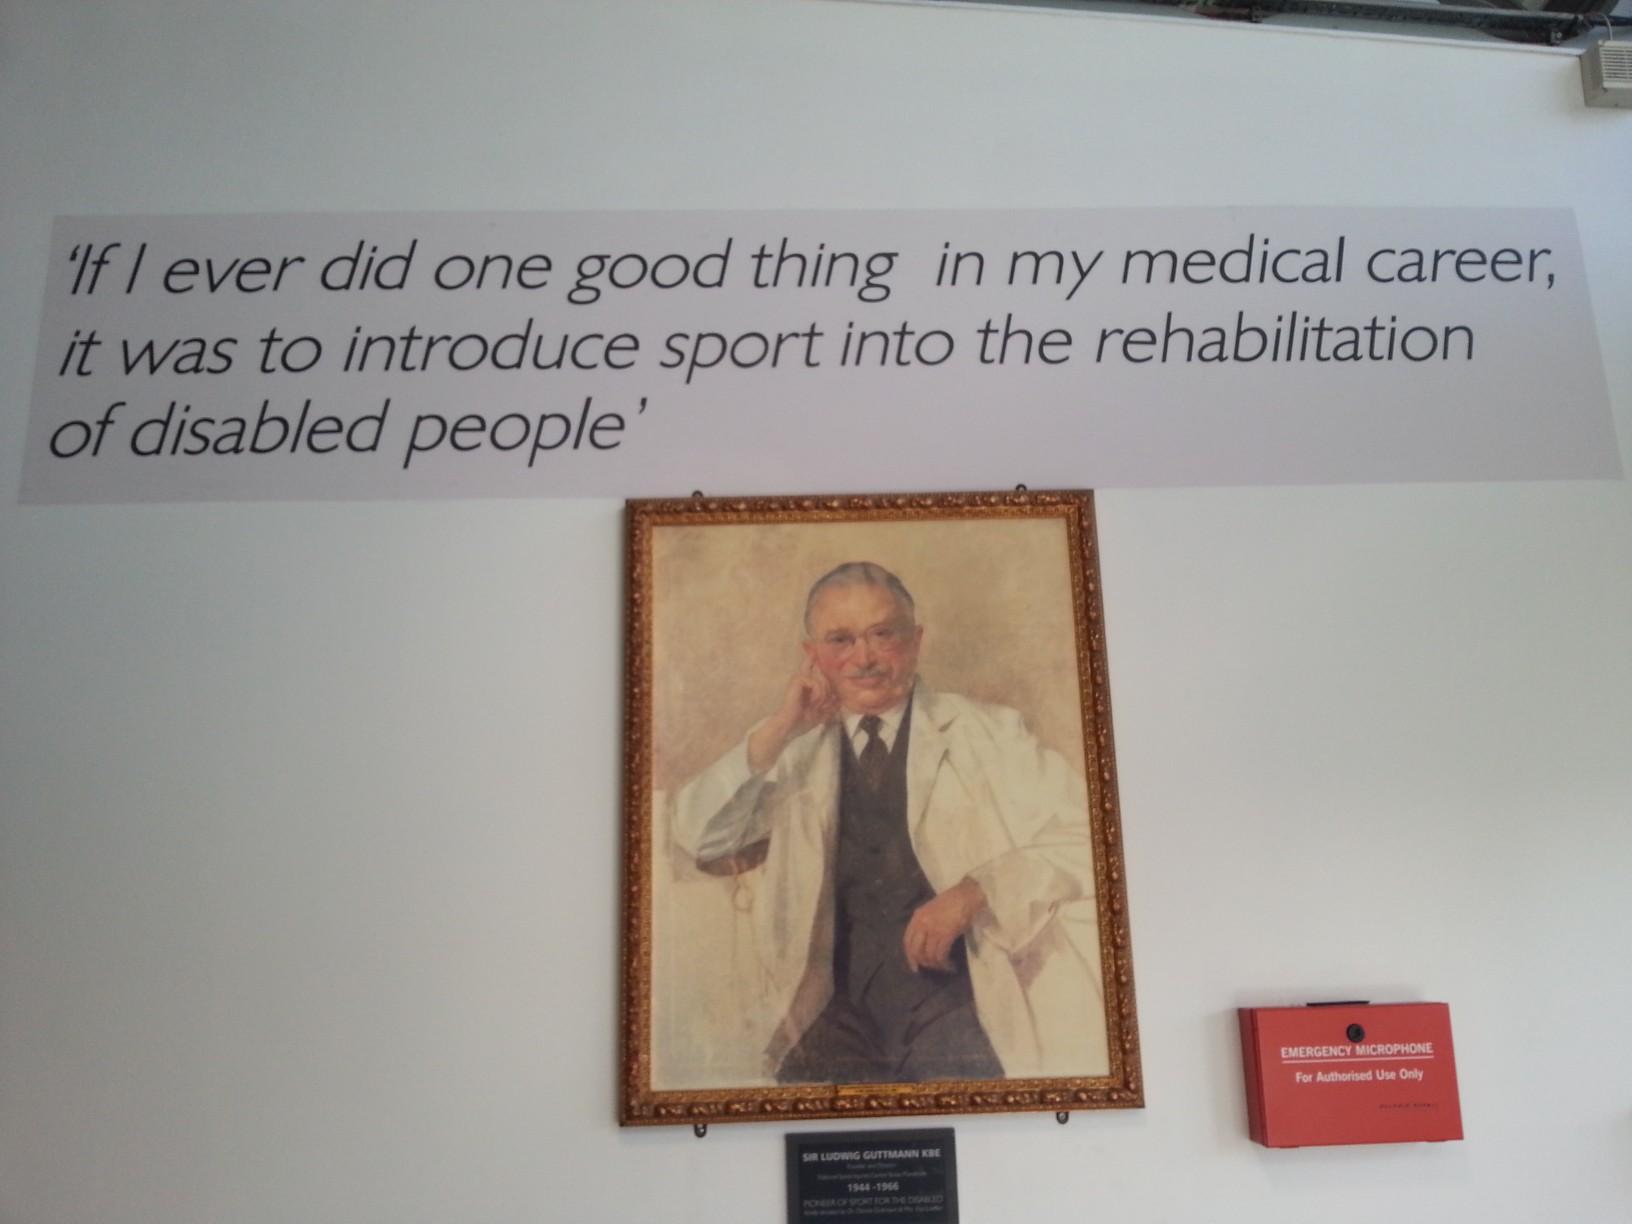 Ludwig-Guttmann founder of Paralympics